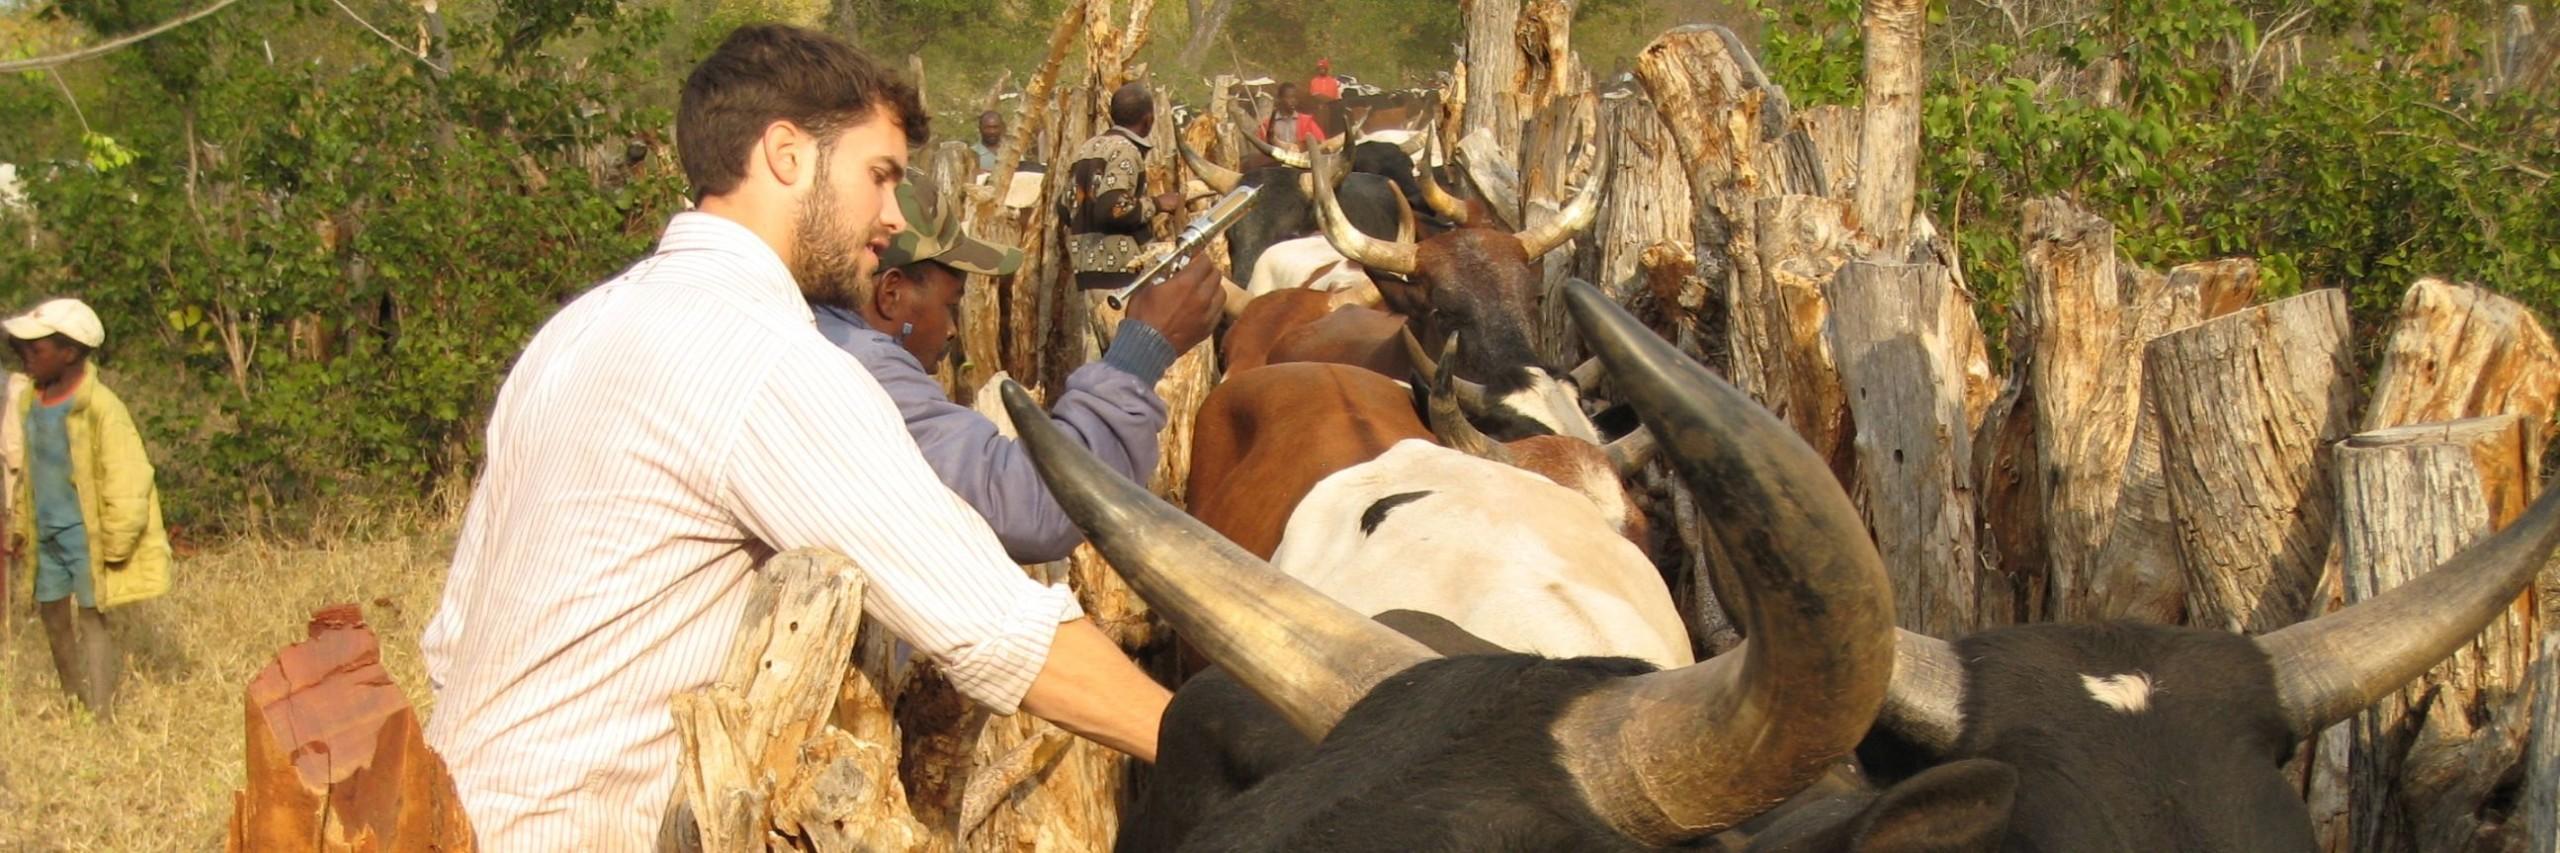 Elliott-Garber-vaccinating-cattle-Mozambique